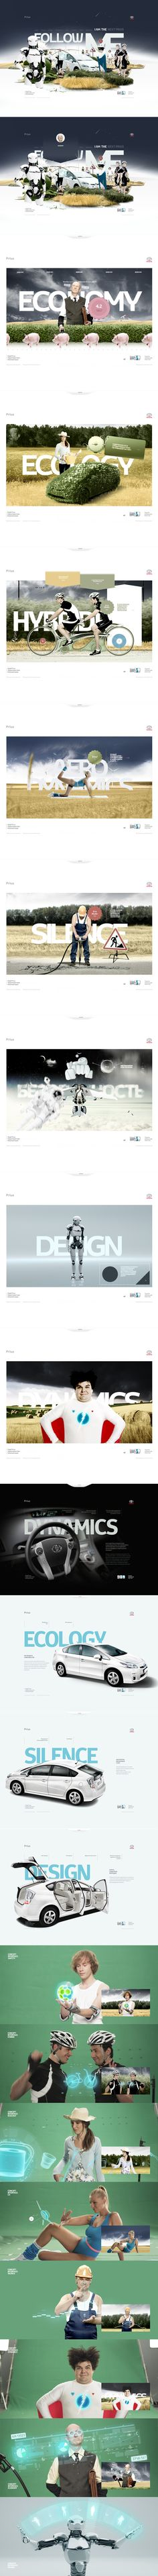 Toyota Prius by Alex Kudryavtsev, via Behance - #web #design